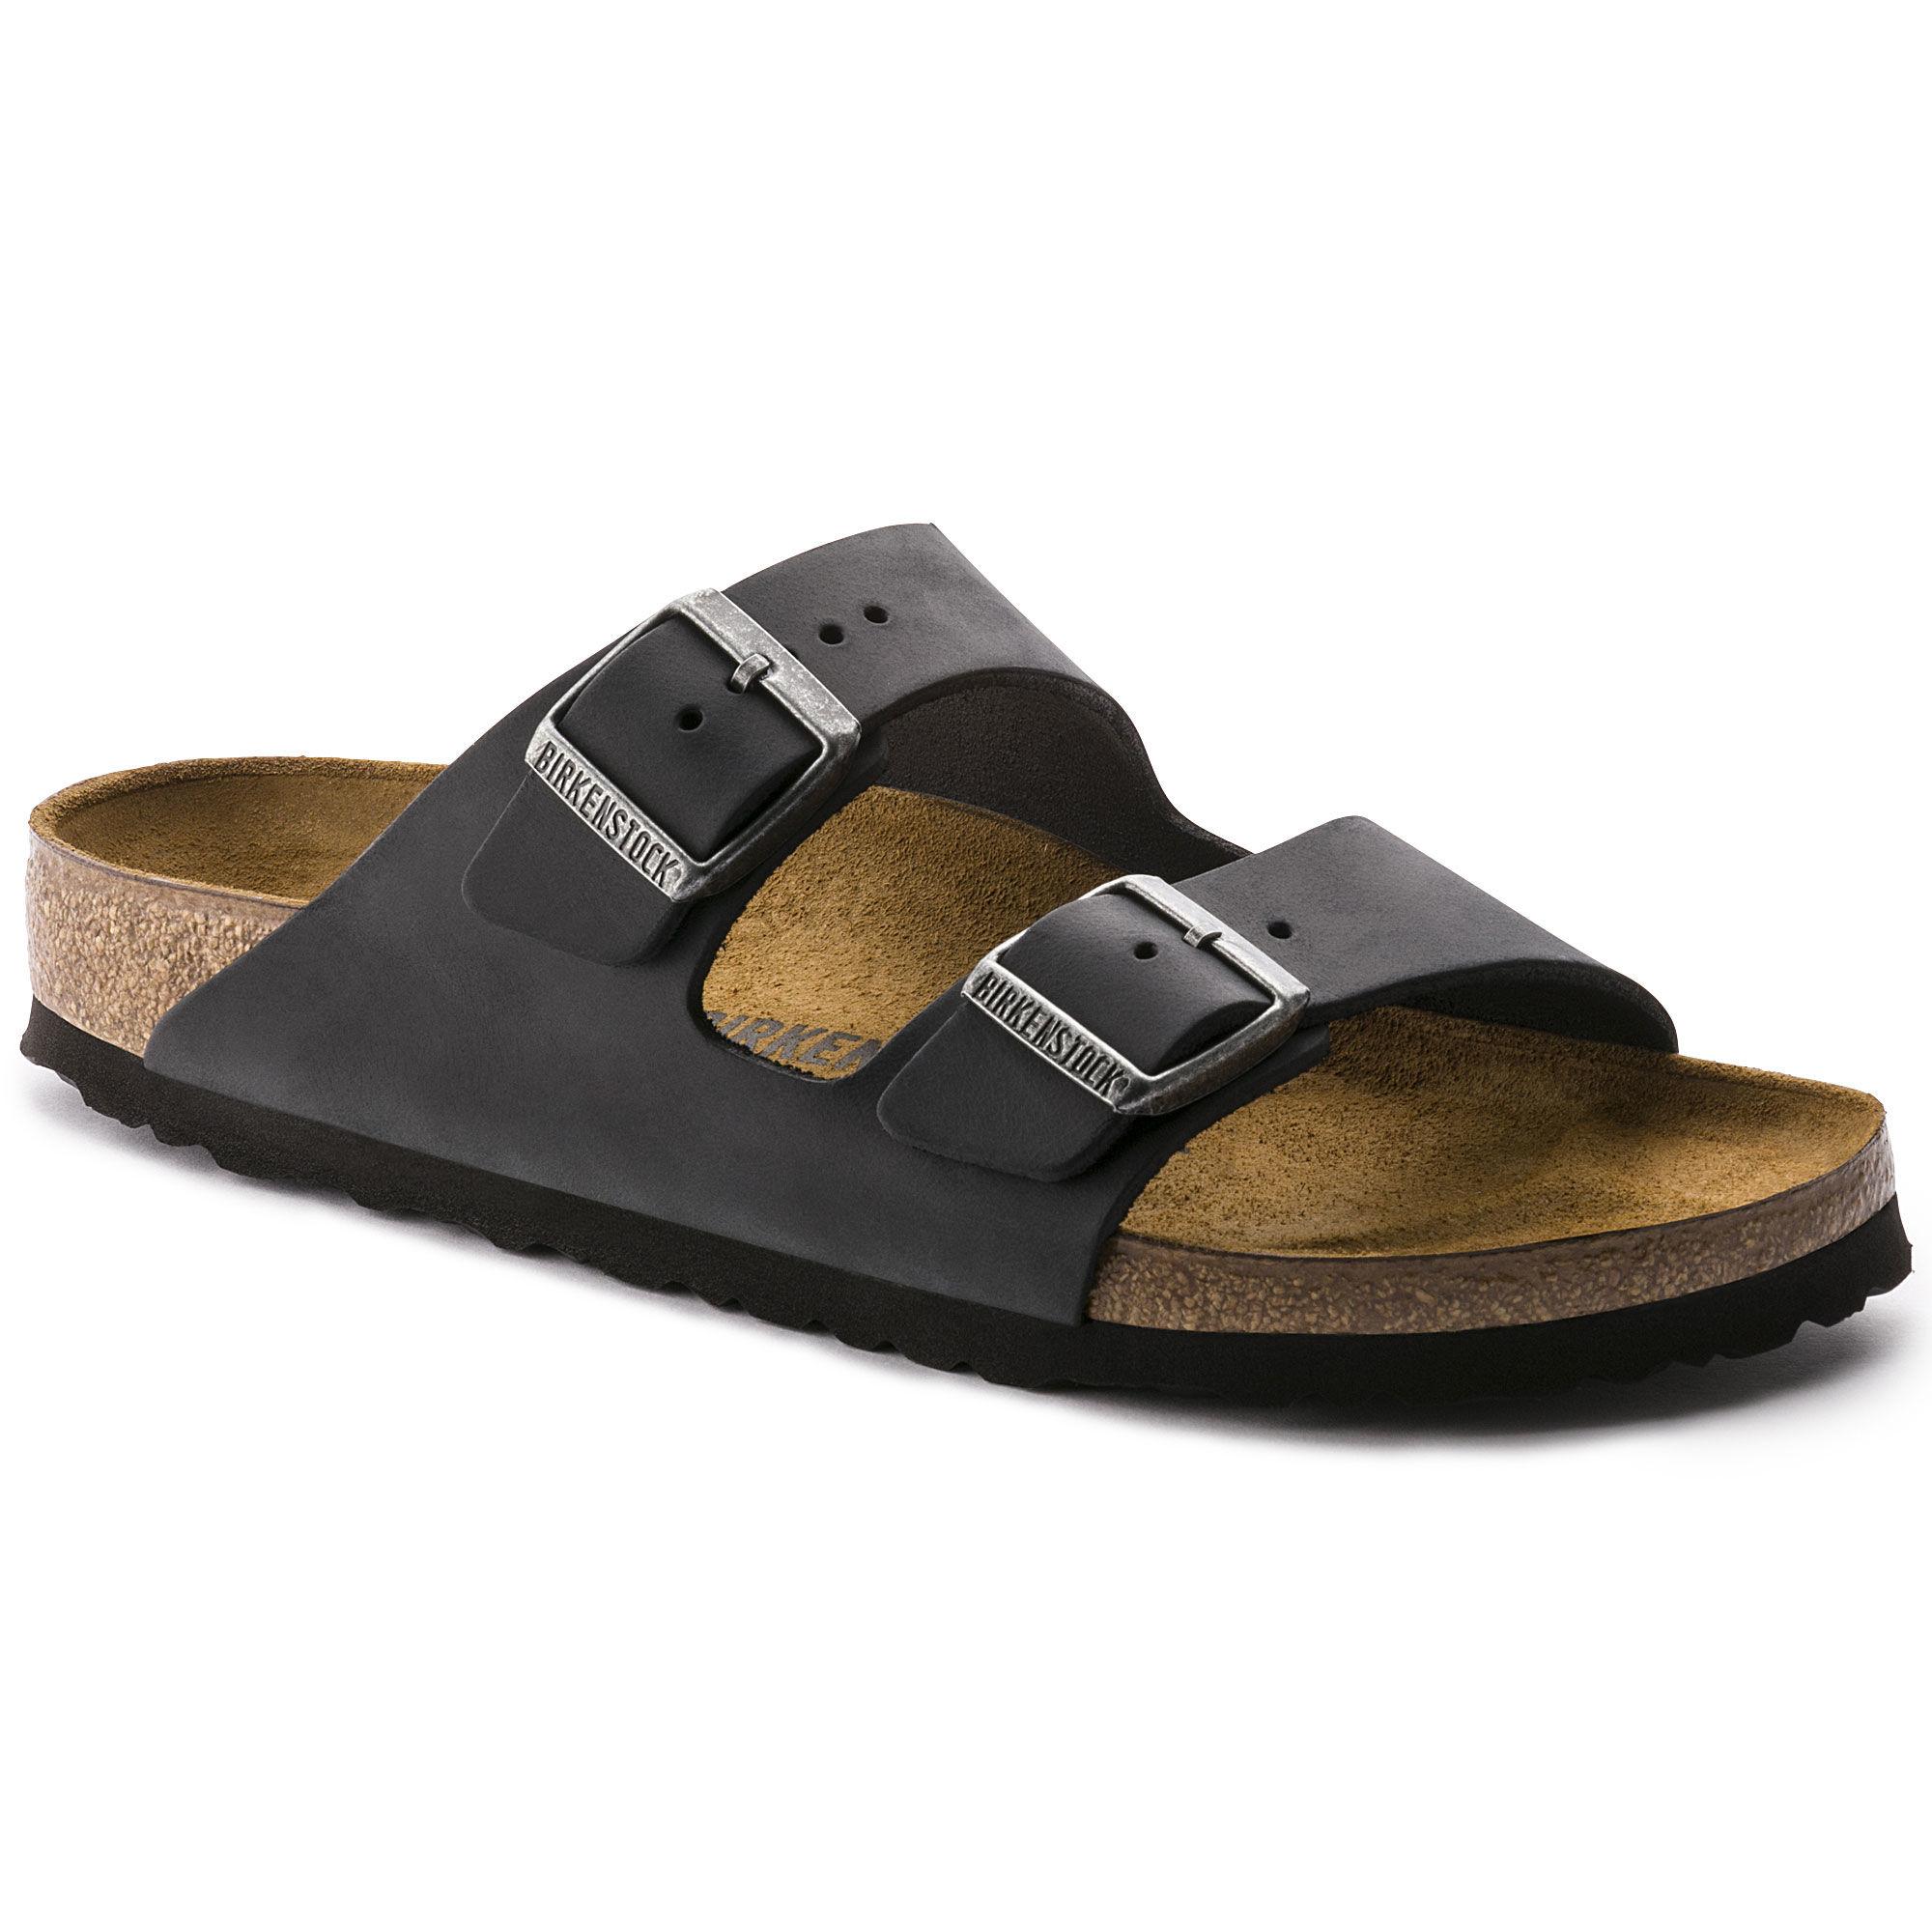 Birkenstock Arizona Black Oil Leather Sandals